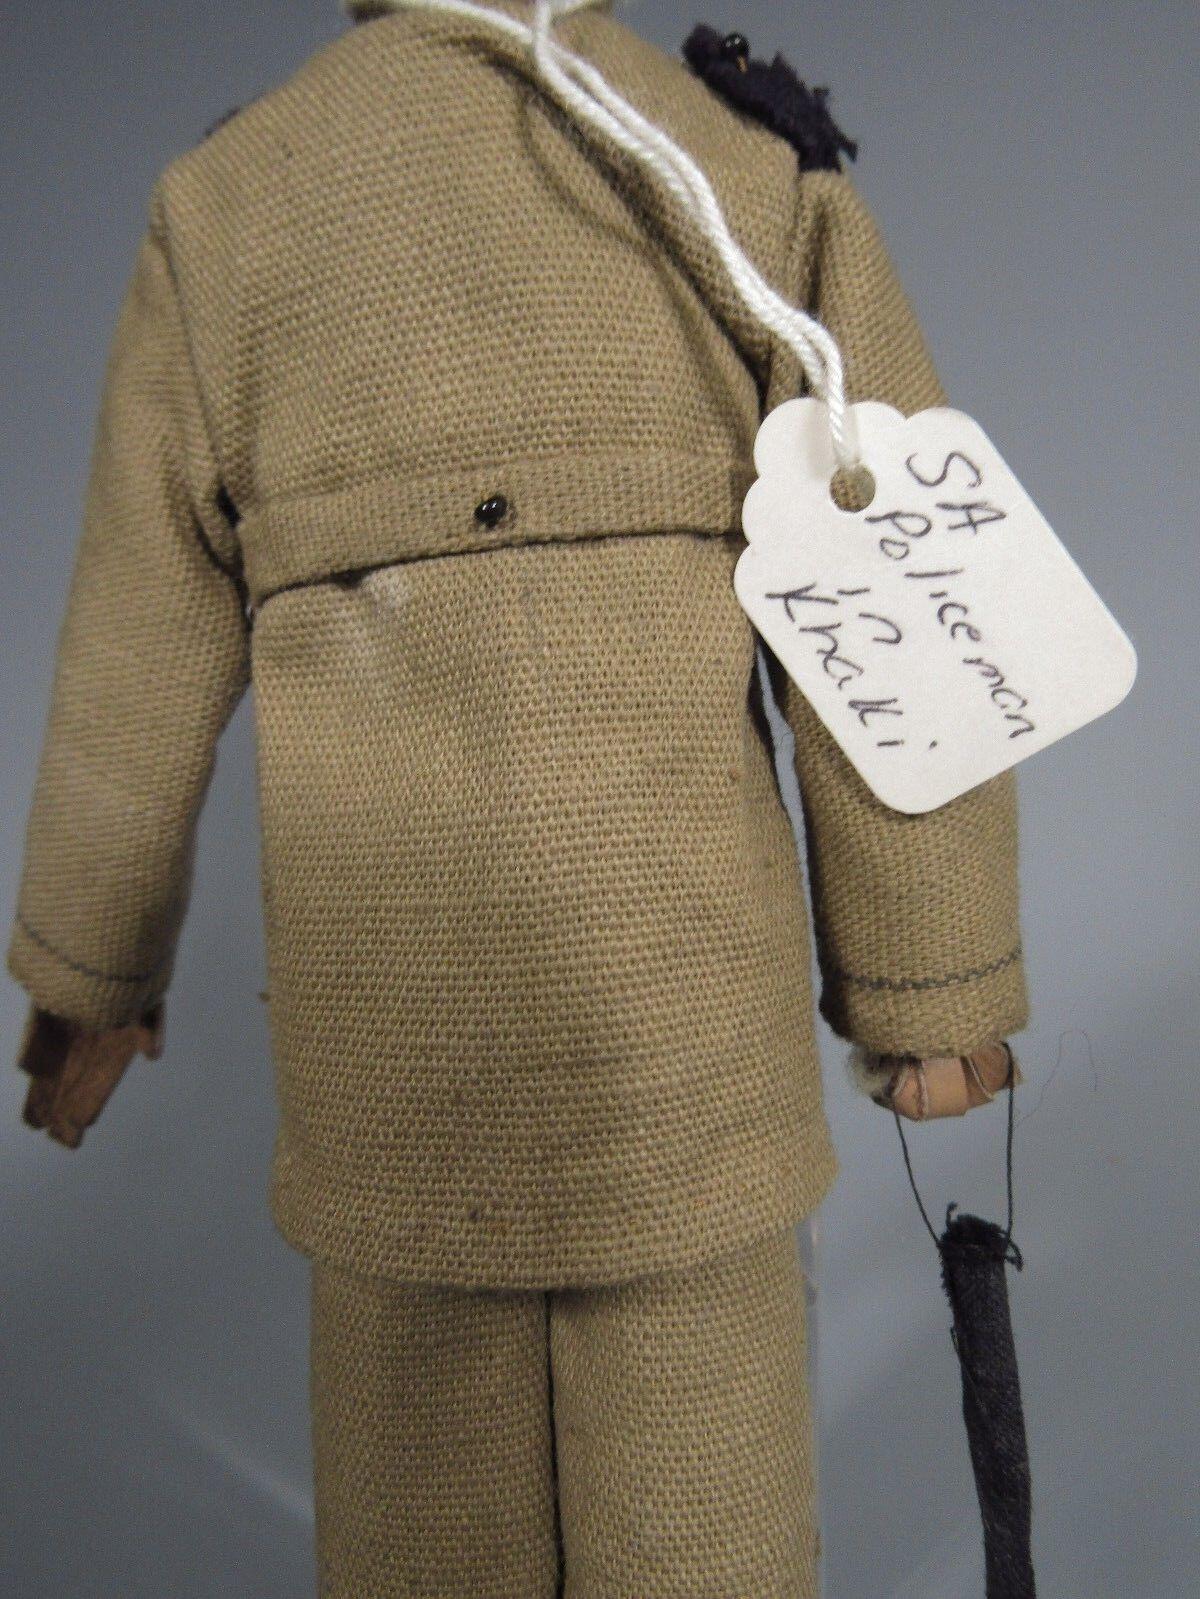 Fine Rare South American Cloth Cloth Cloth bambola of a poliziauomo Officer Soldier ca. 19-20th c 6b3a3a